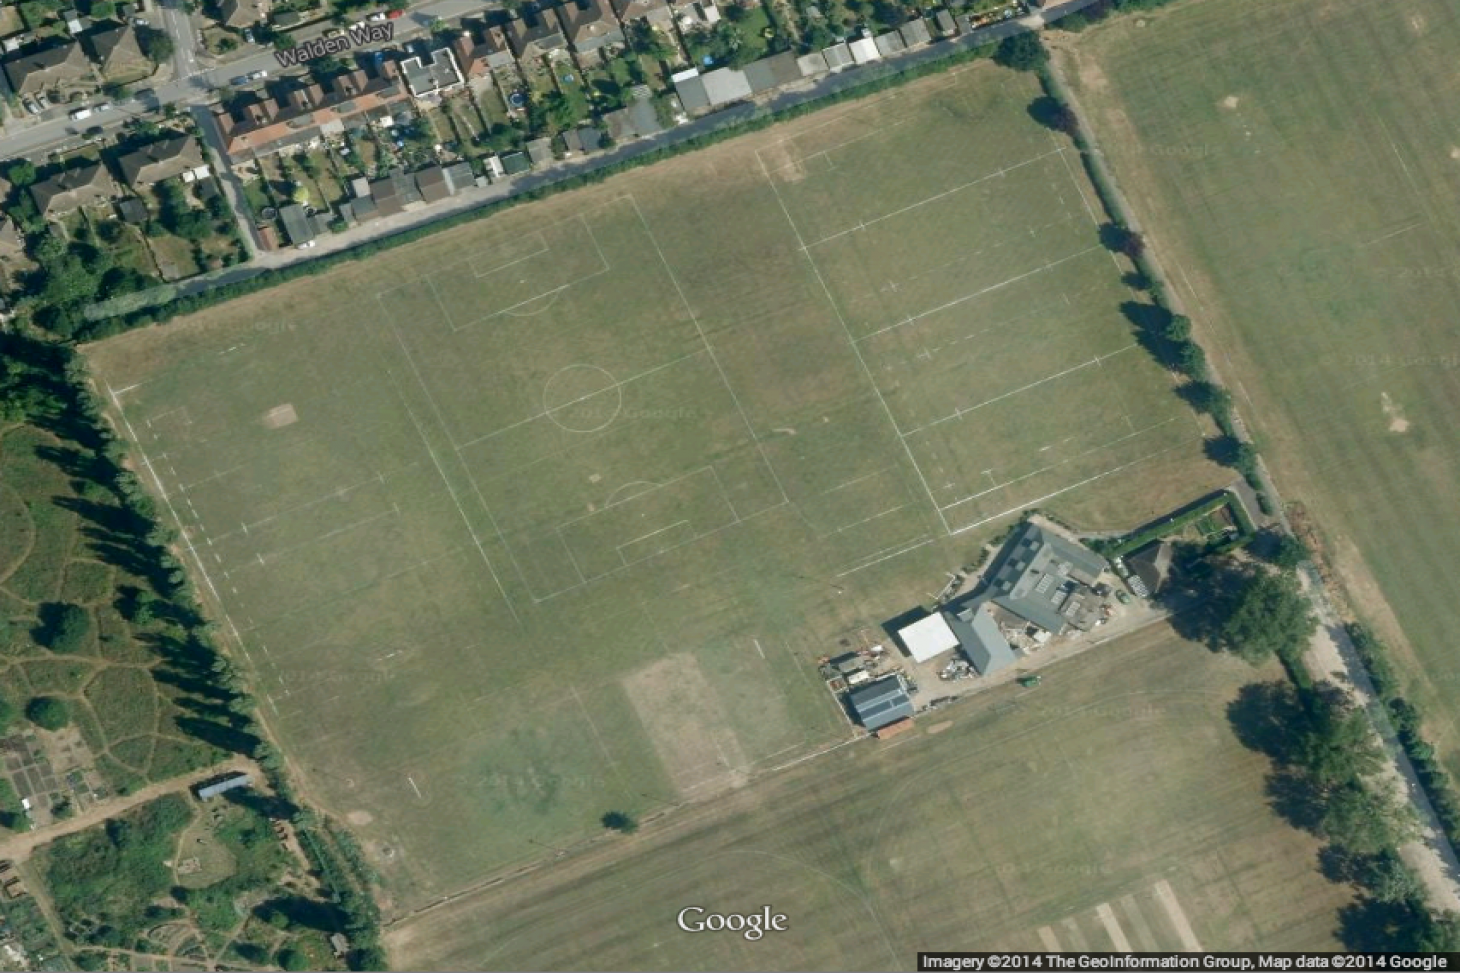 Fairlop Oak Playing Field 5 a side | Grass football pitch